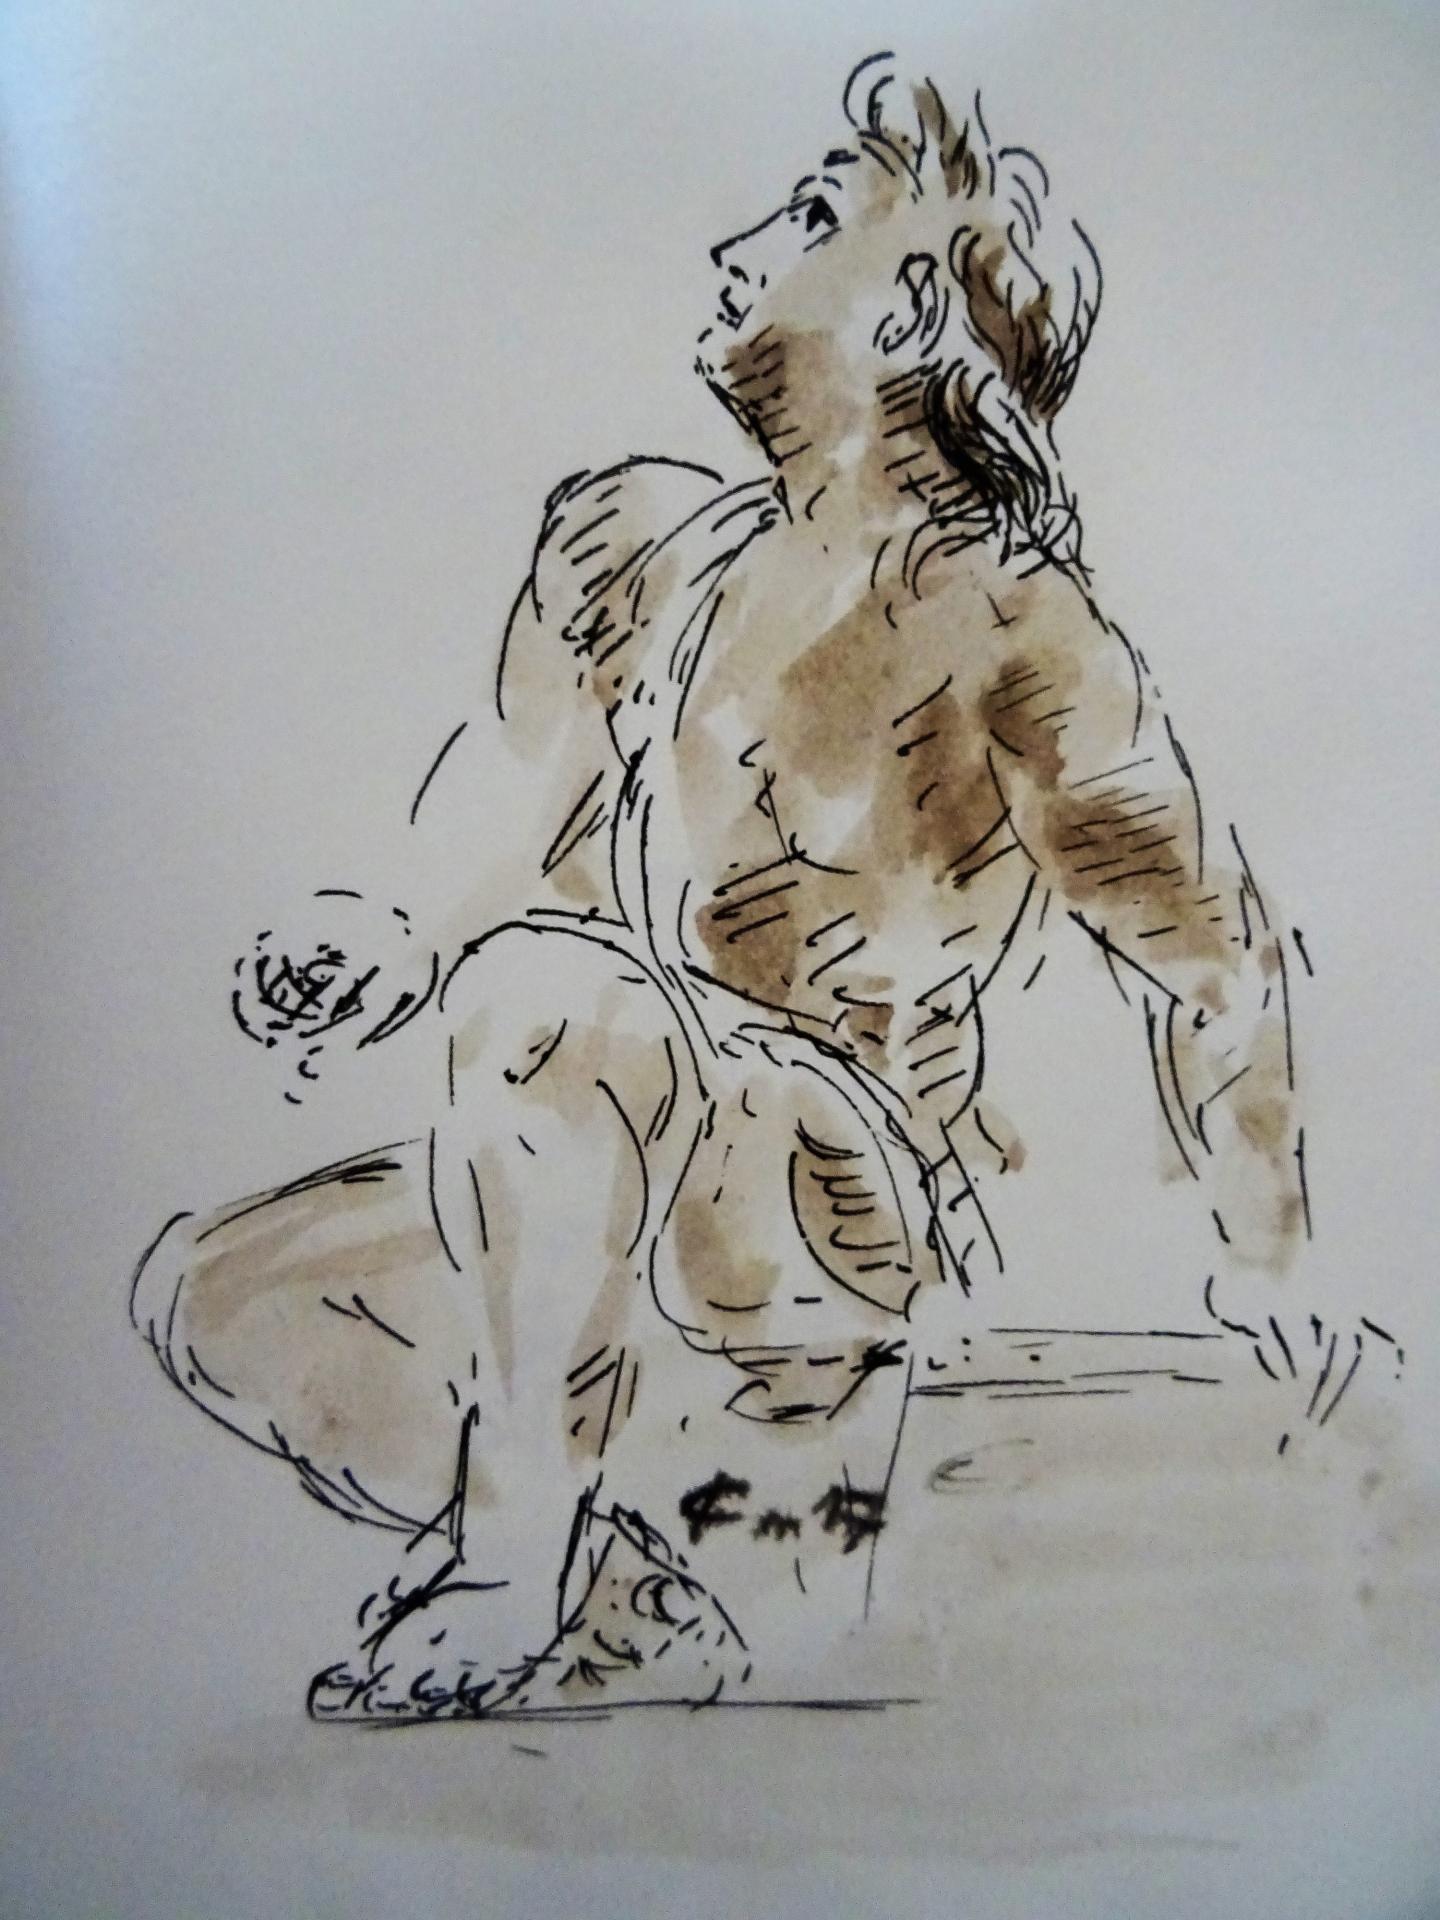 Dessin au lavis de jean joseph chevalier 189